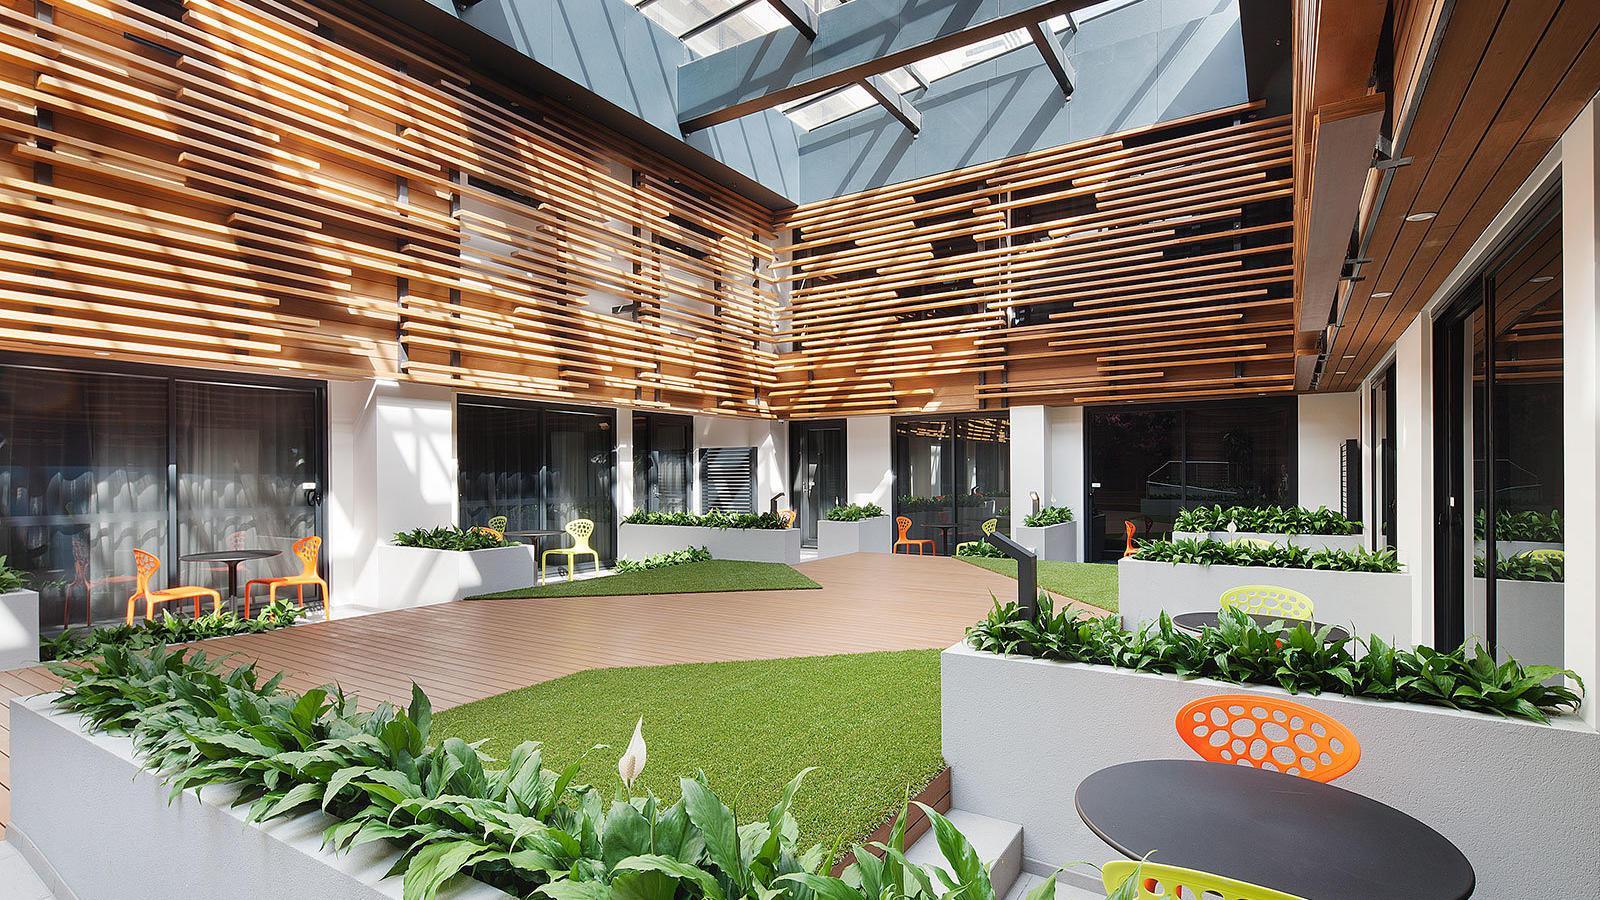 Courtyard at Jasper Hotel Melbourne